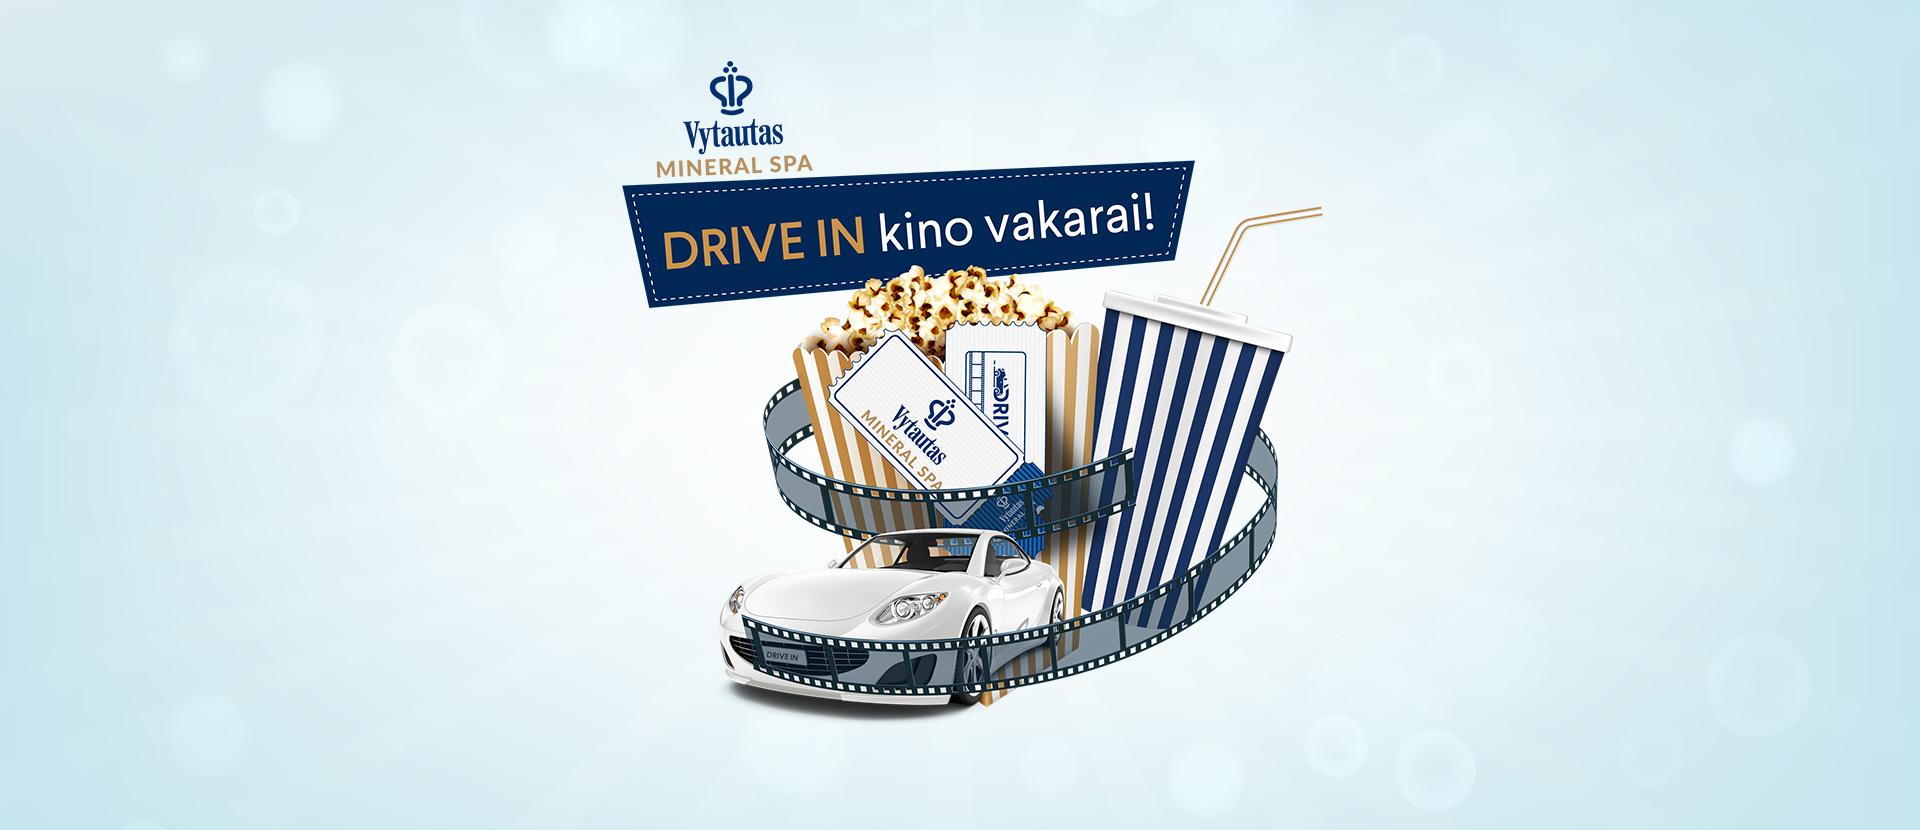 """Vytautas Mineral SPA"" kviečia į DRIVE -IN kino vakarus Birštone"